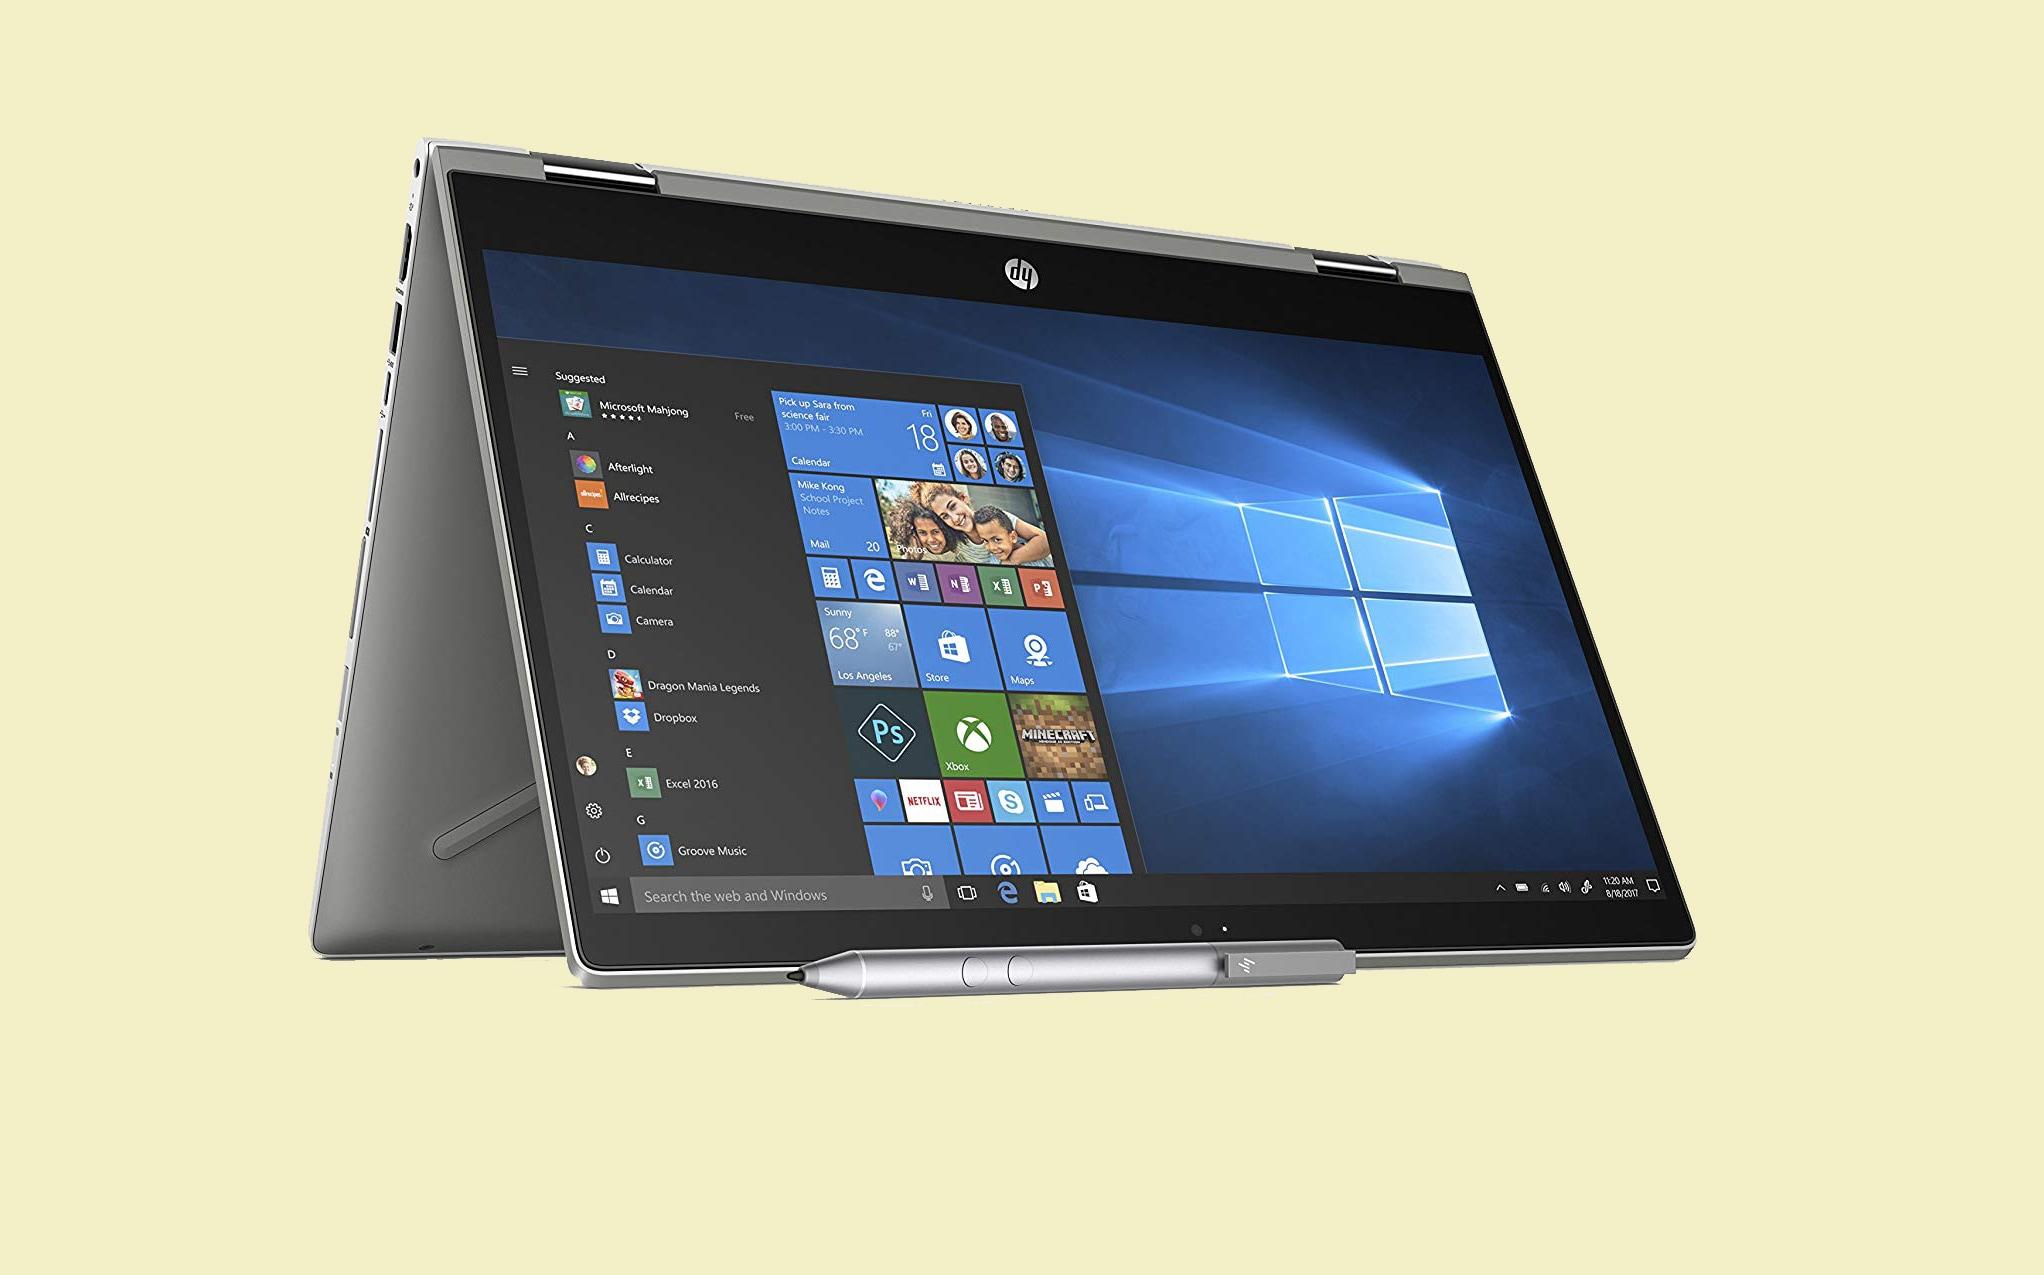 Offerta imperdibile per HyperX SAVAGE EXO: un SSD portatile da 960 GB a 179€! - image HP-Premium-Pavilion-x360 on https://www.zxbyte.com